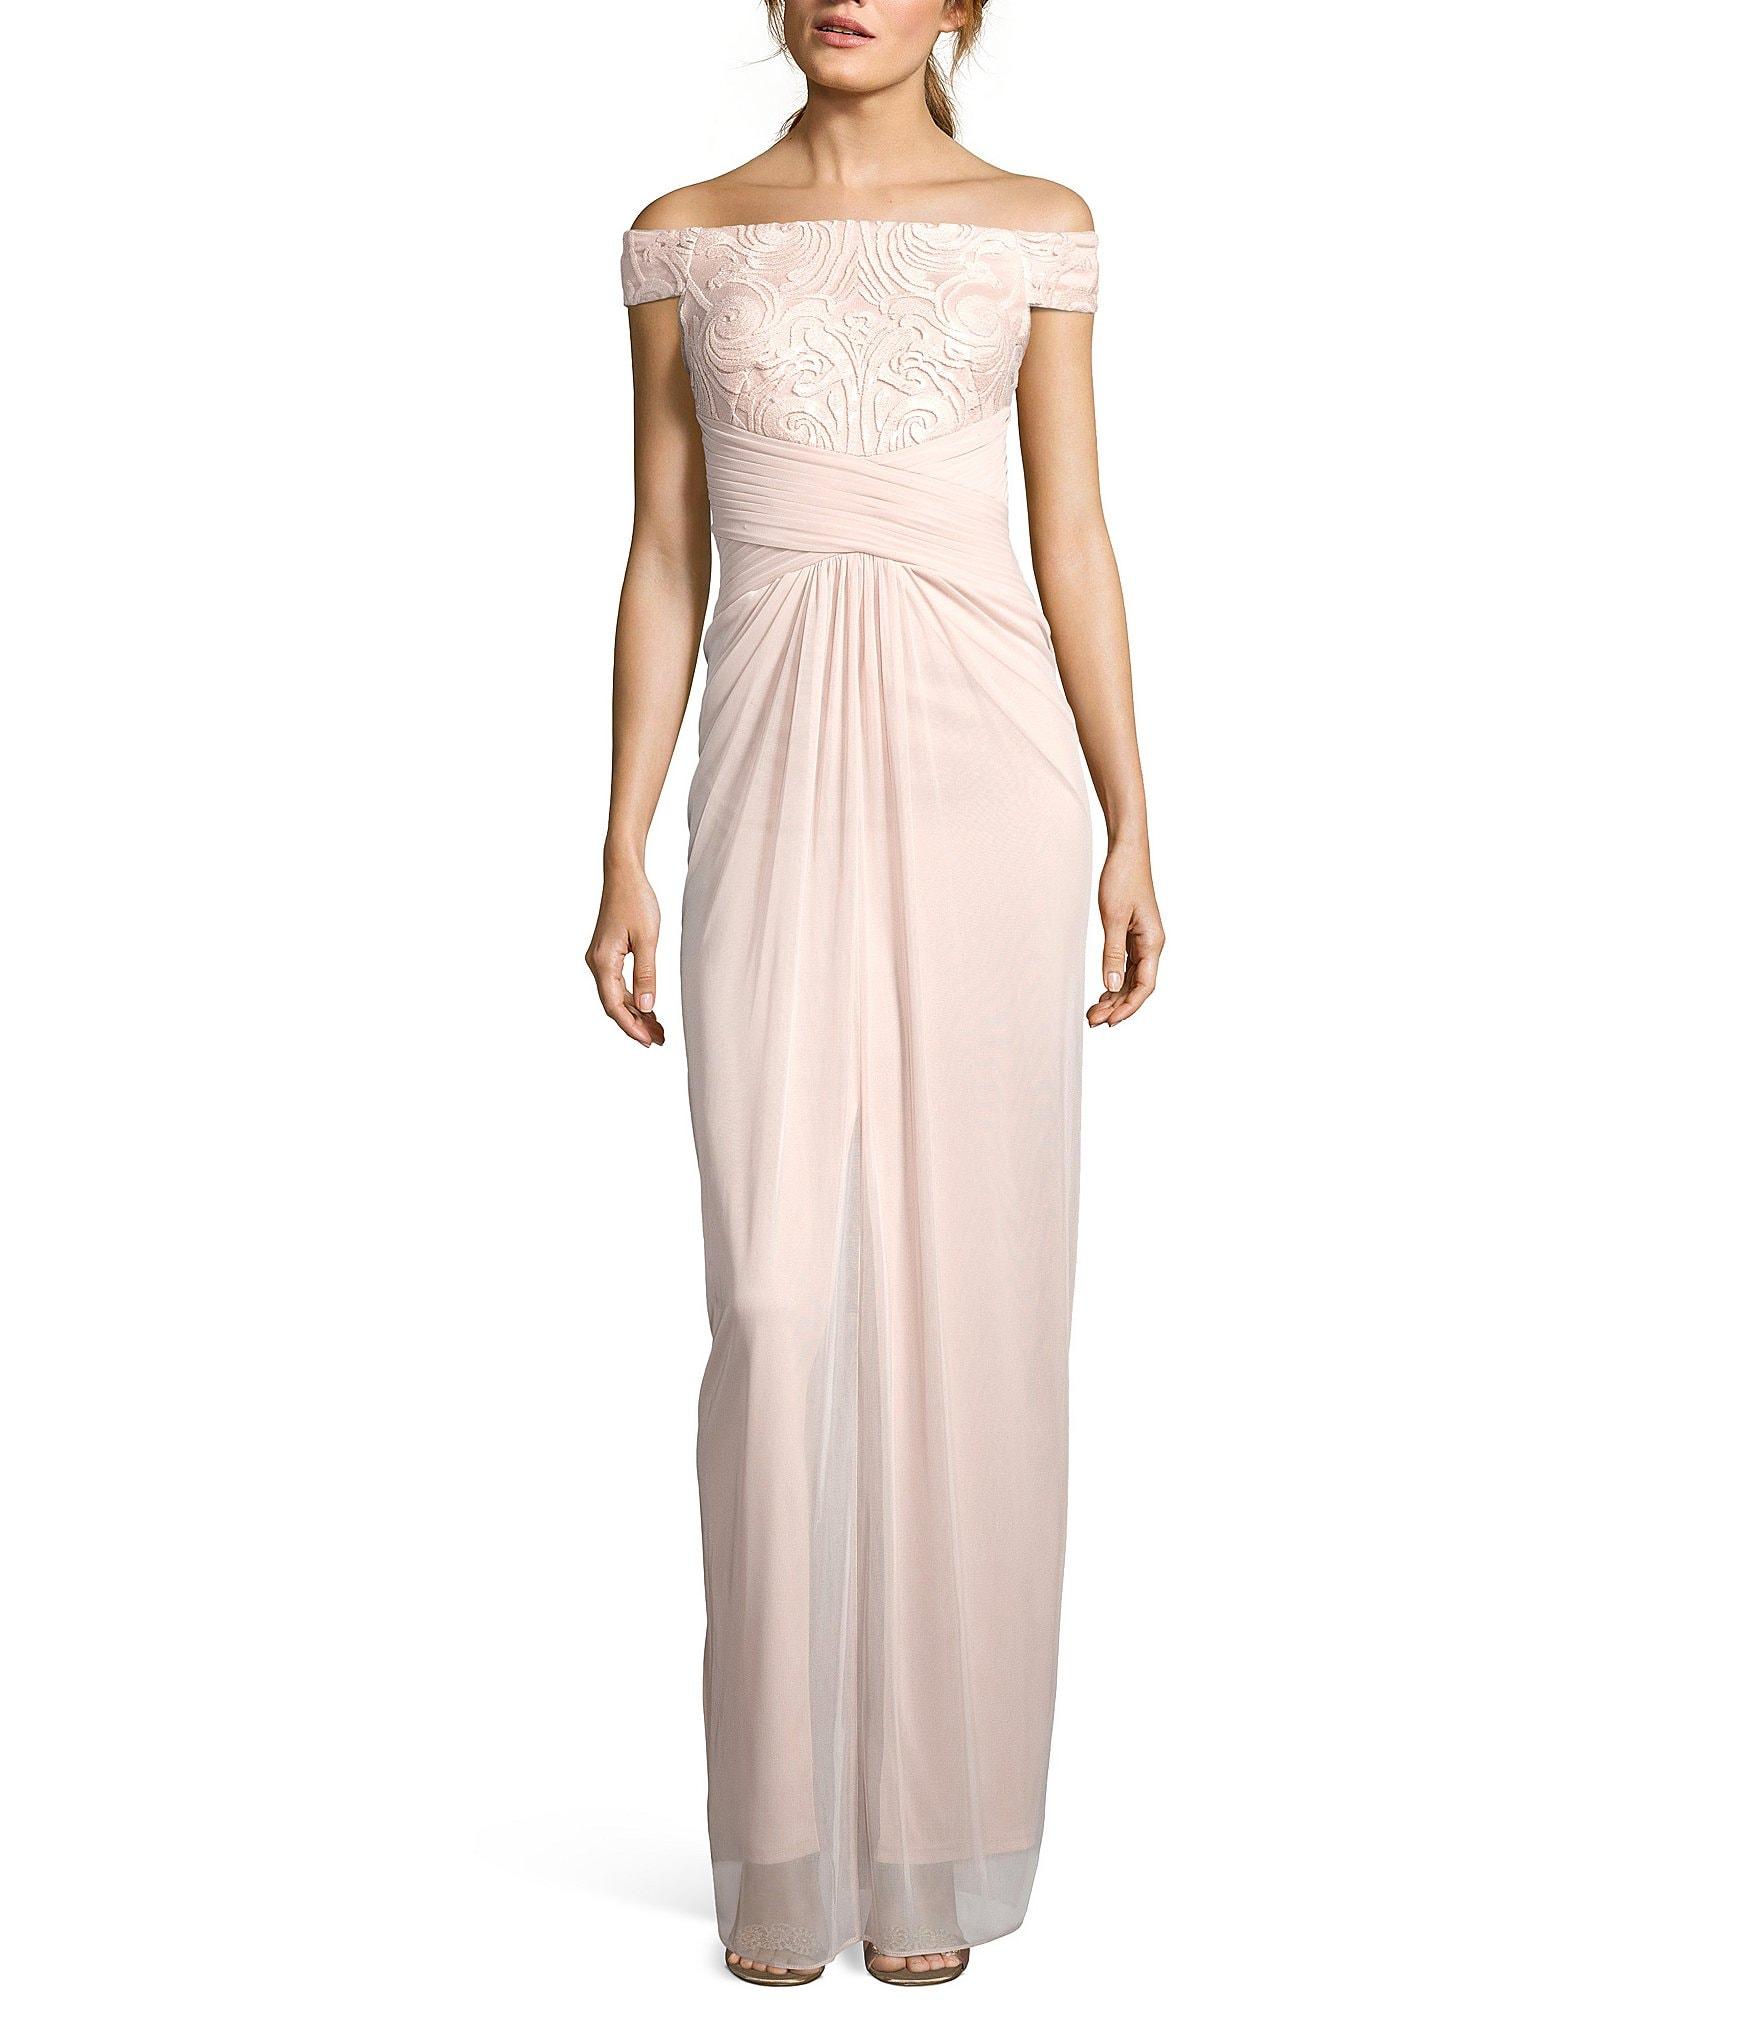 Women\'s Clothing | Dresses | Dillards.com